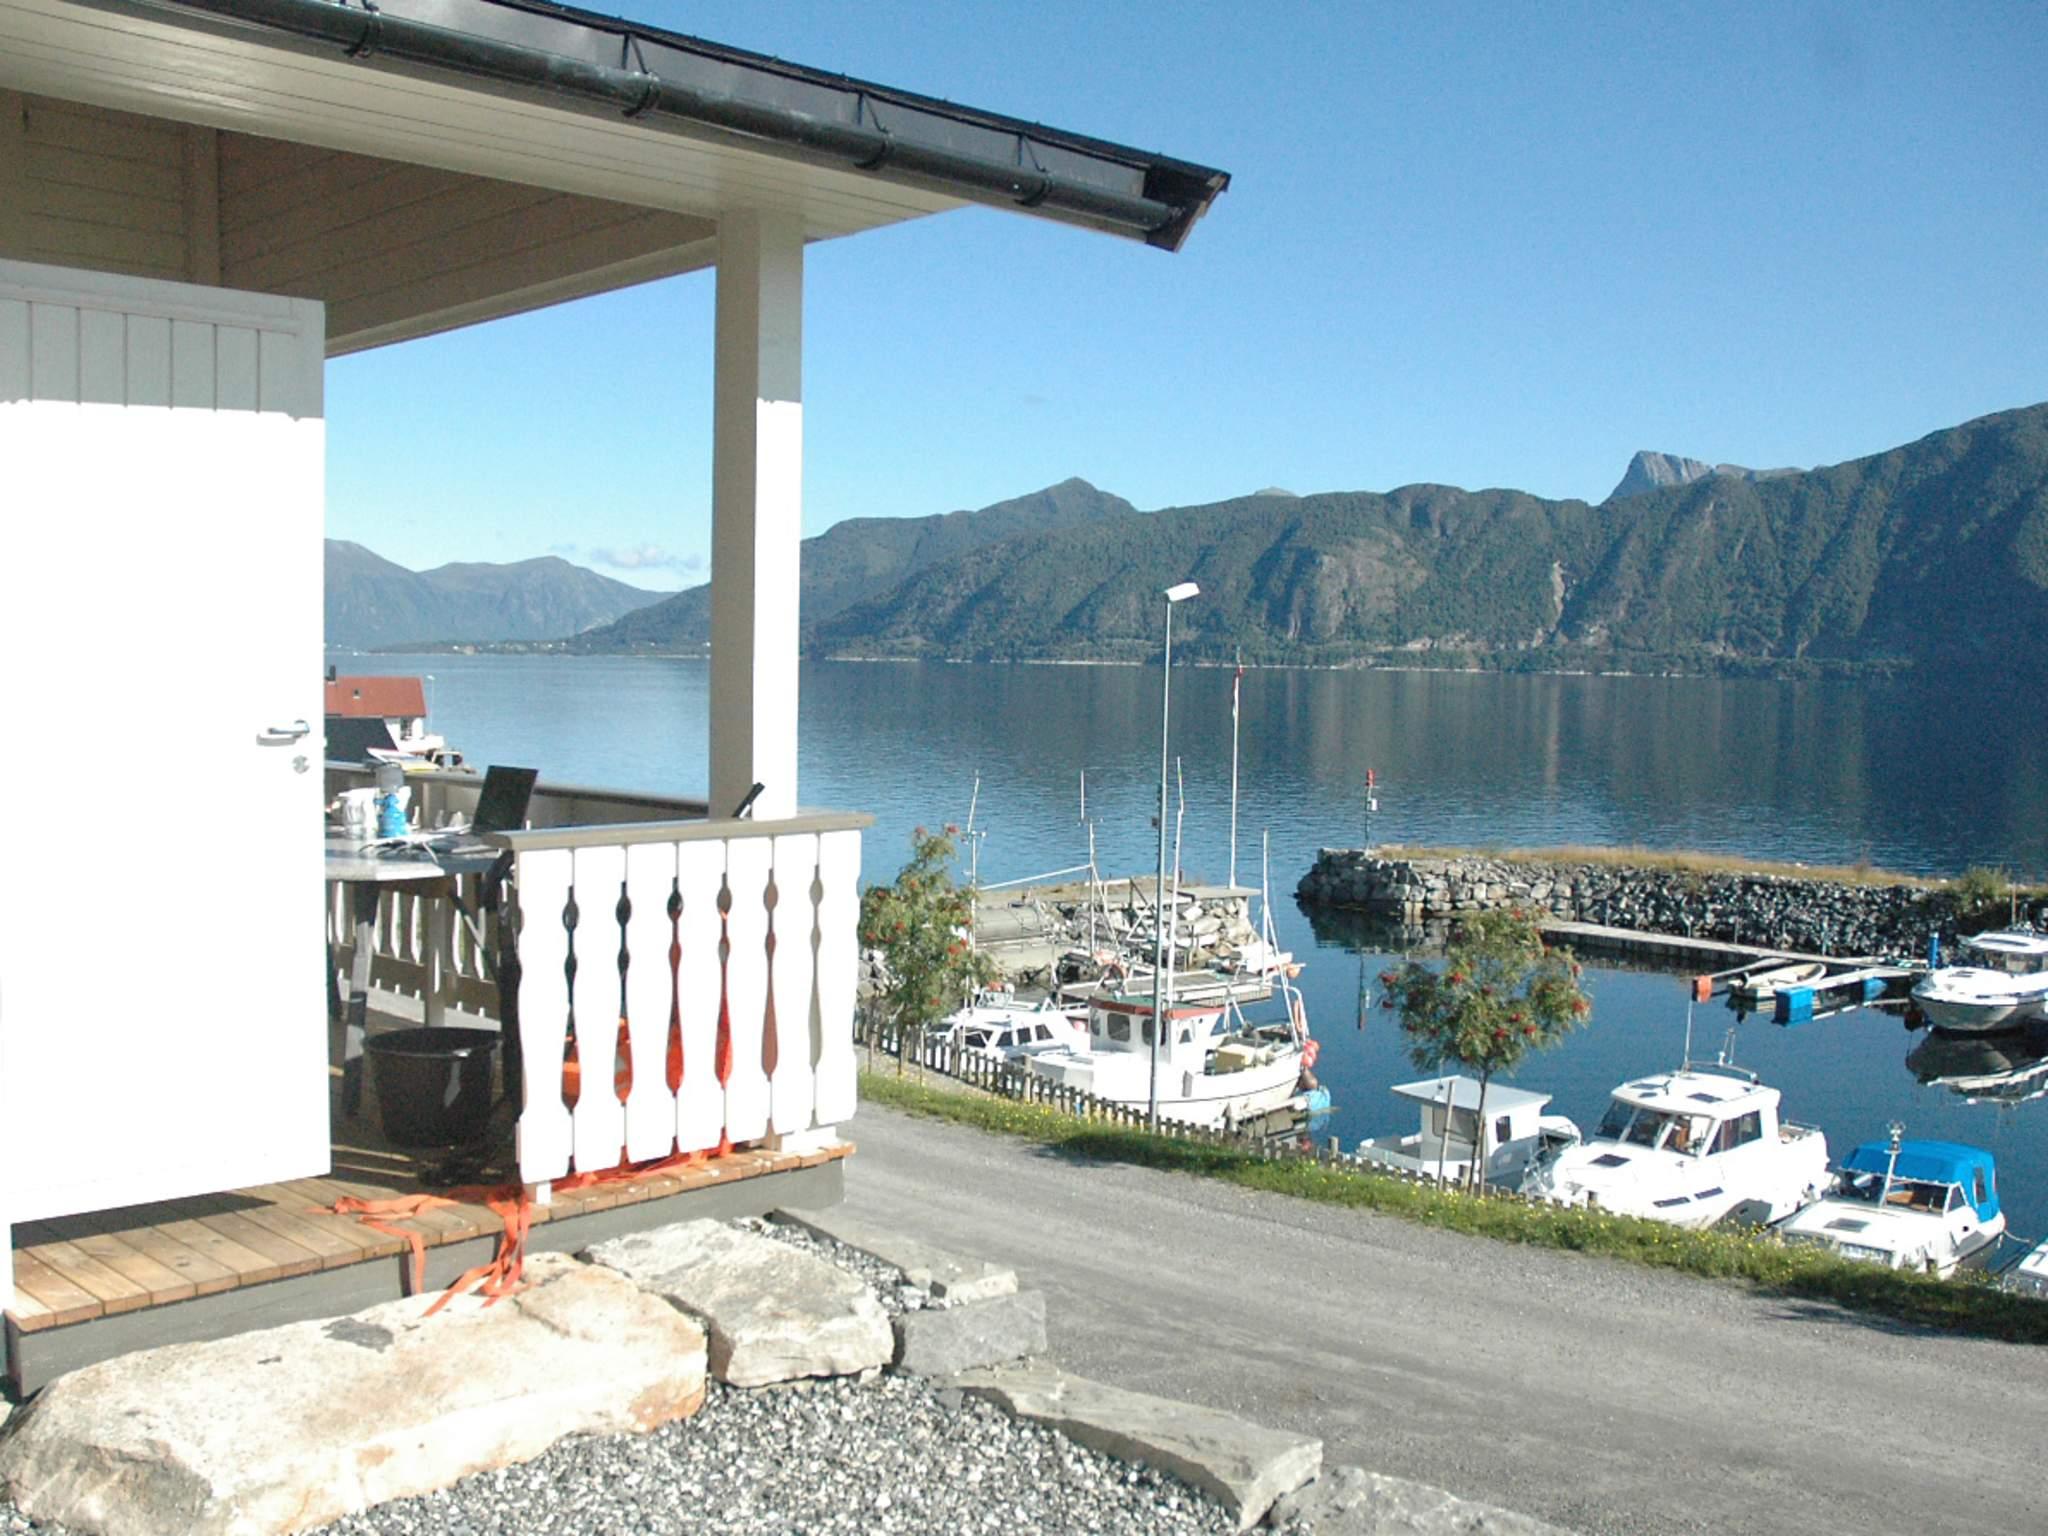 Ferienhaus Lauvstad (276049), Lauvstad, More - Romsdal, Westnorwegen, Norwegen, Bild 22